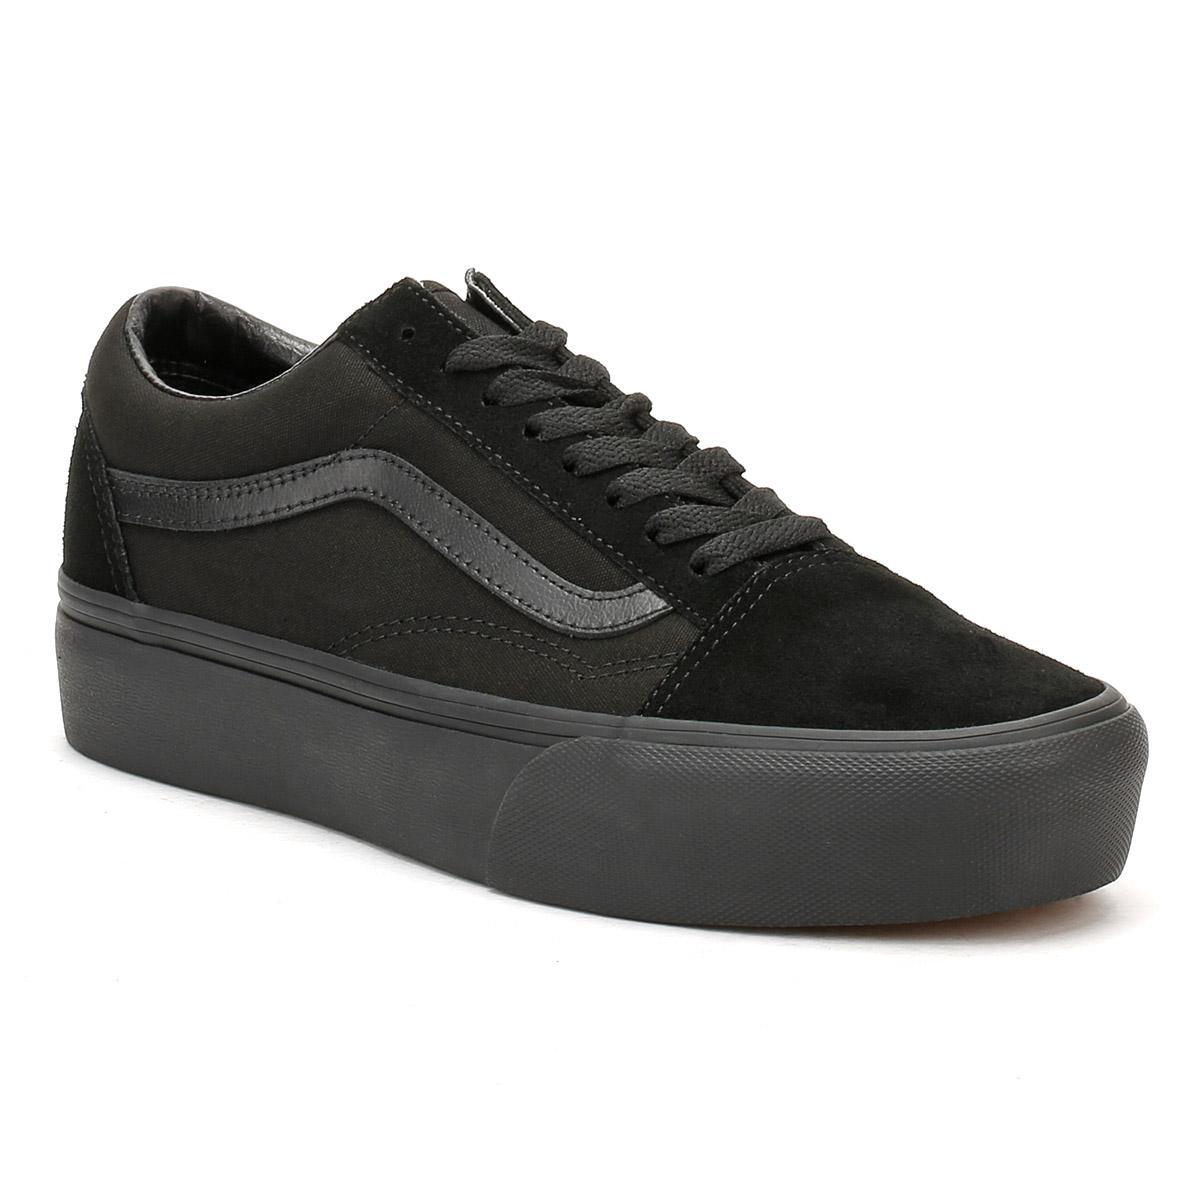 9e8cca36d32 Vans Womens Black   Black Old Skool Platform Trainers in Black ...